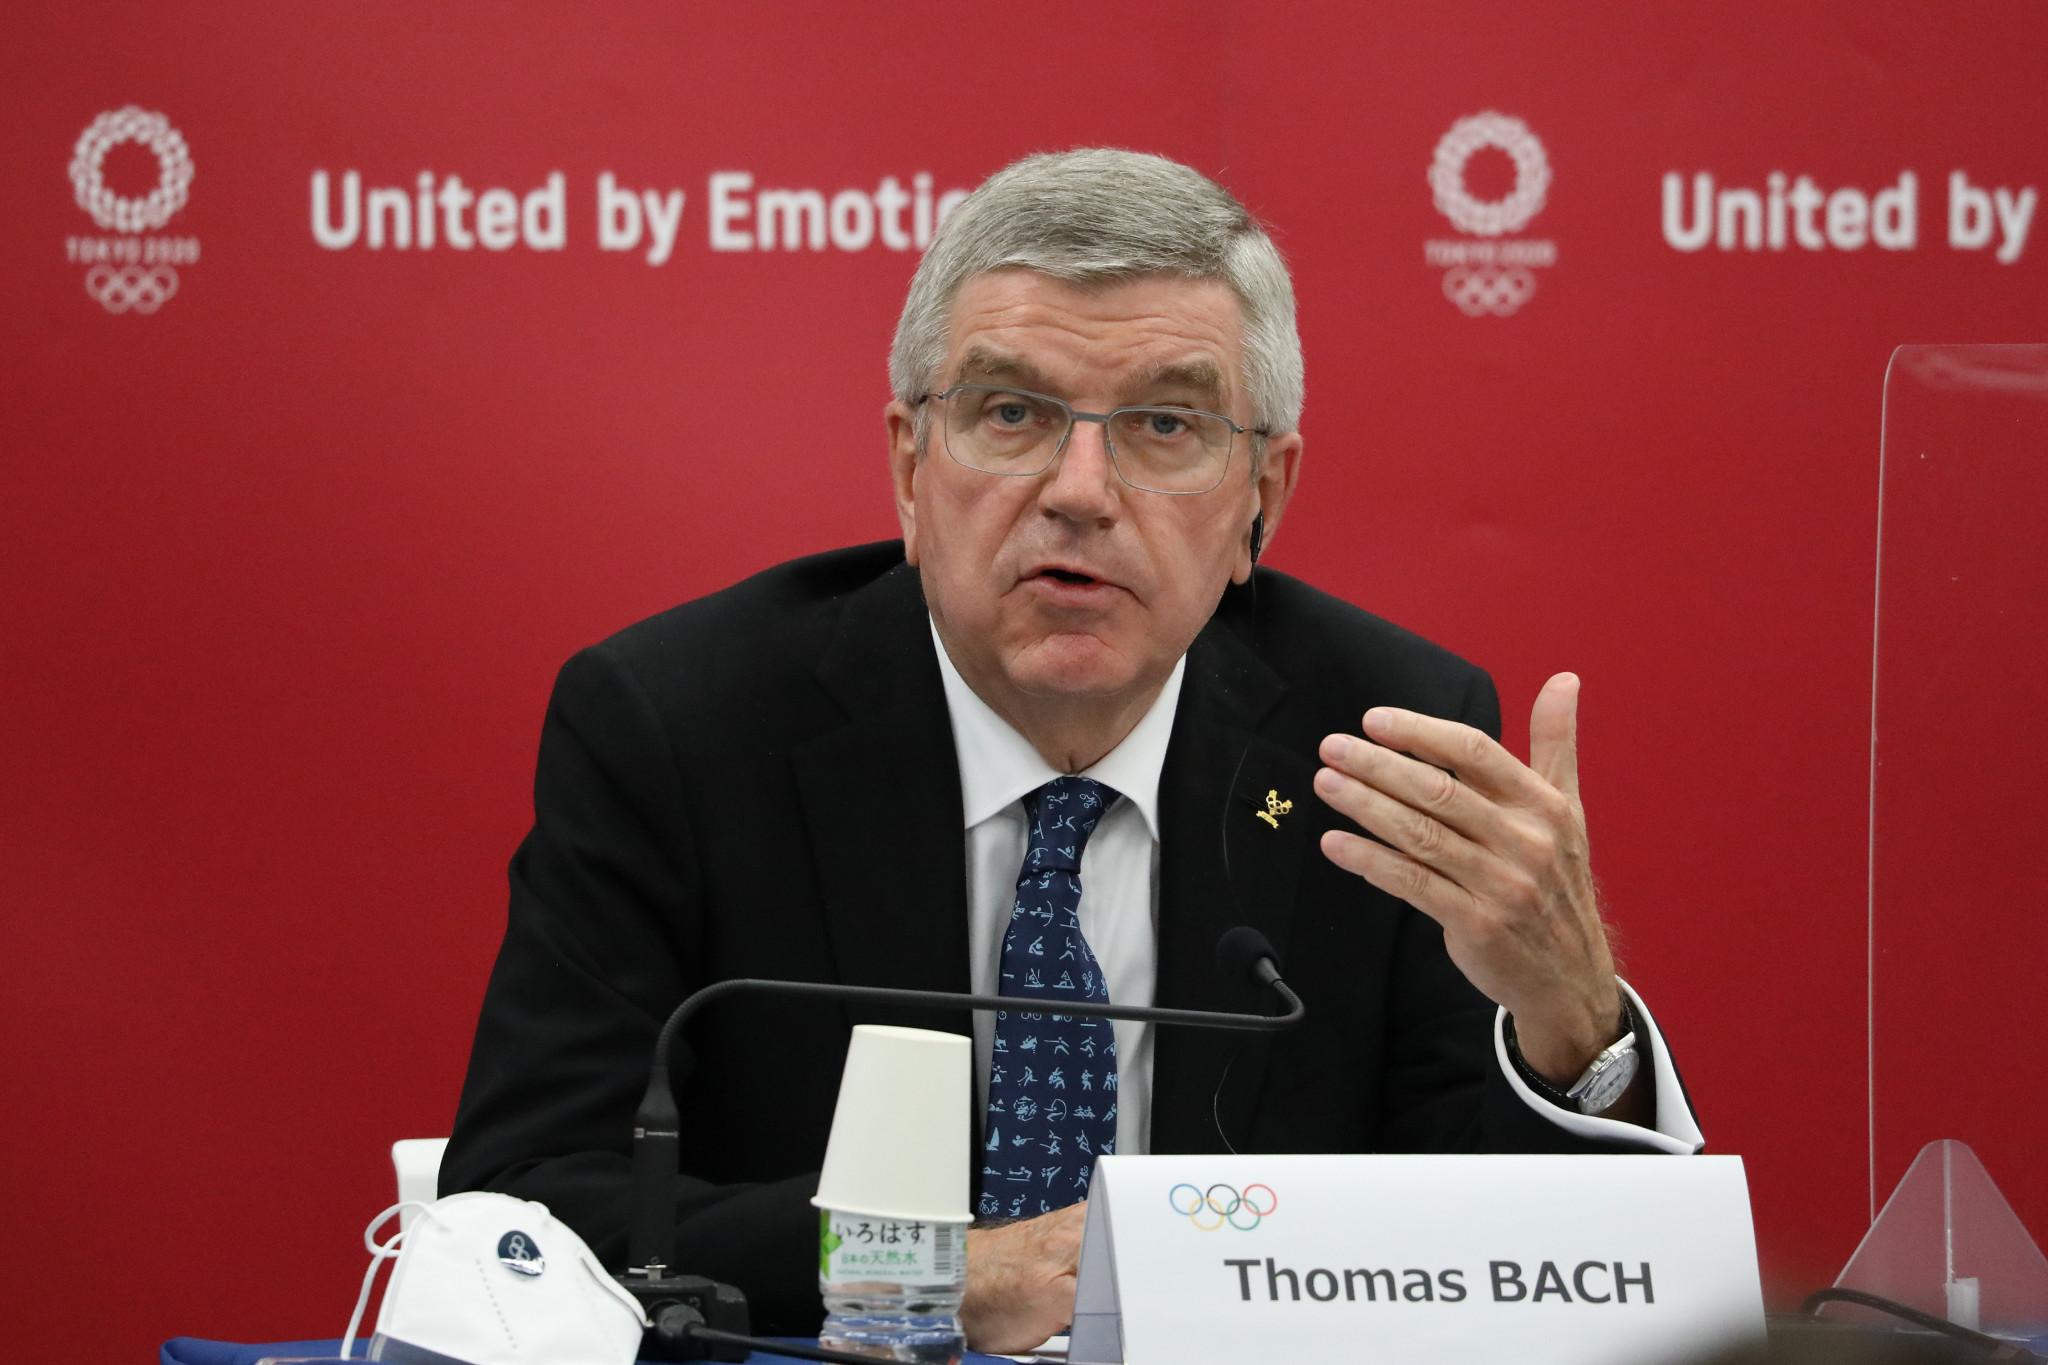 IOC President Thomas Bach said the organisation would keep